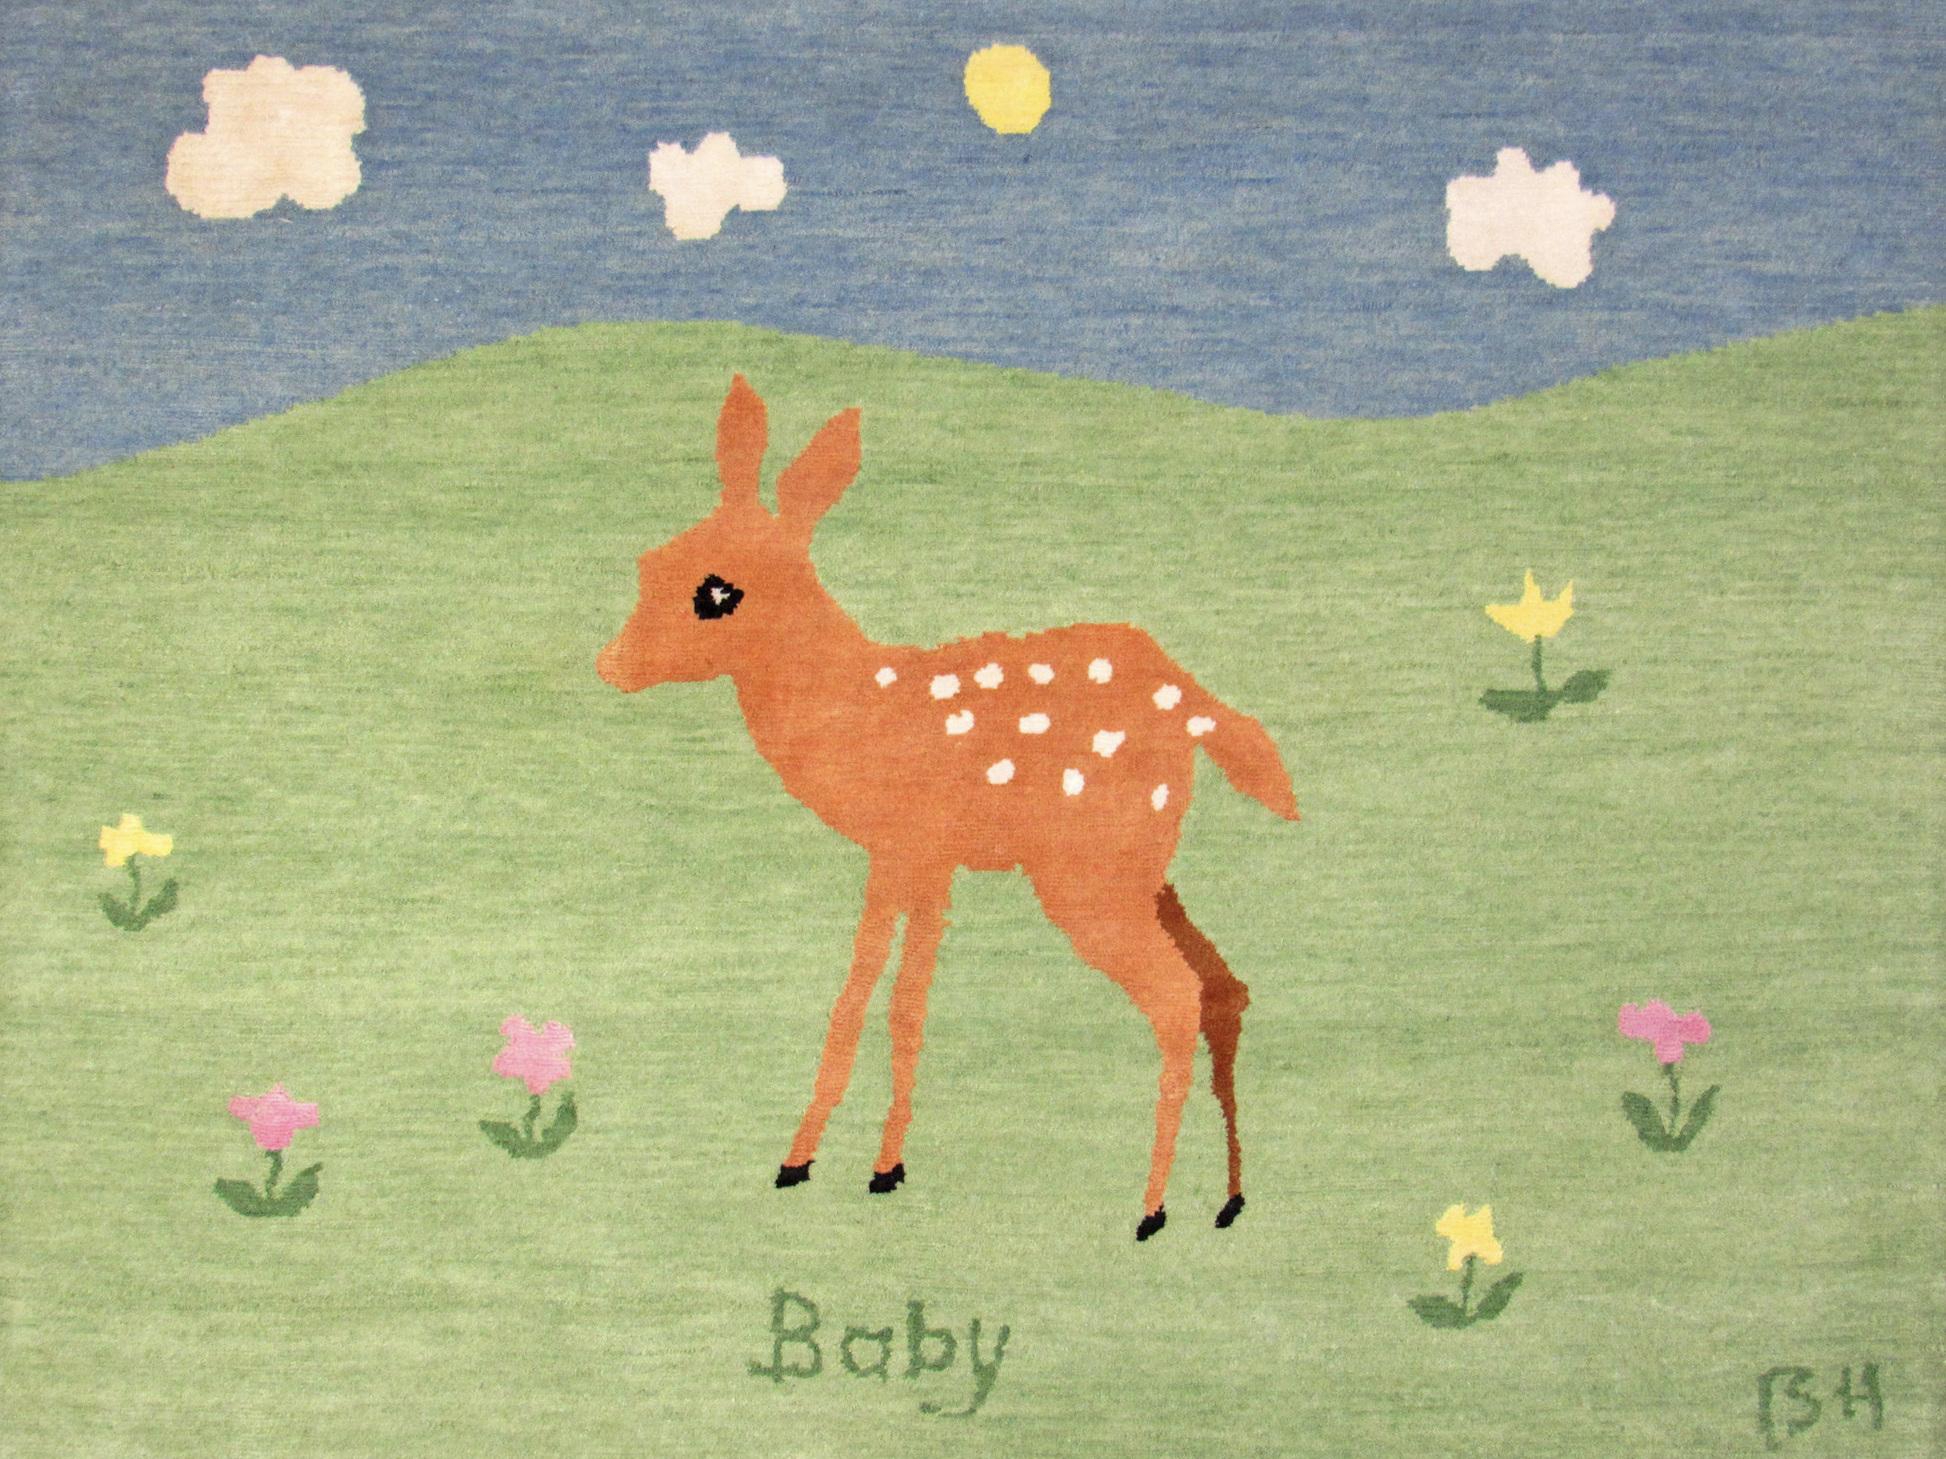 BHEST_Rug_Baby.jpg